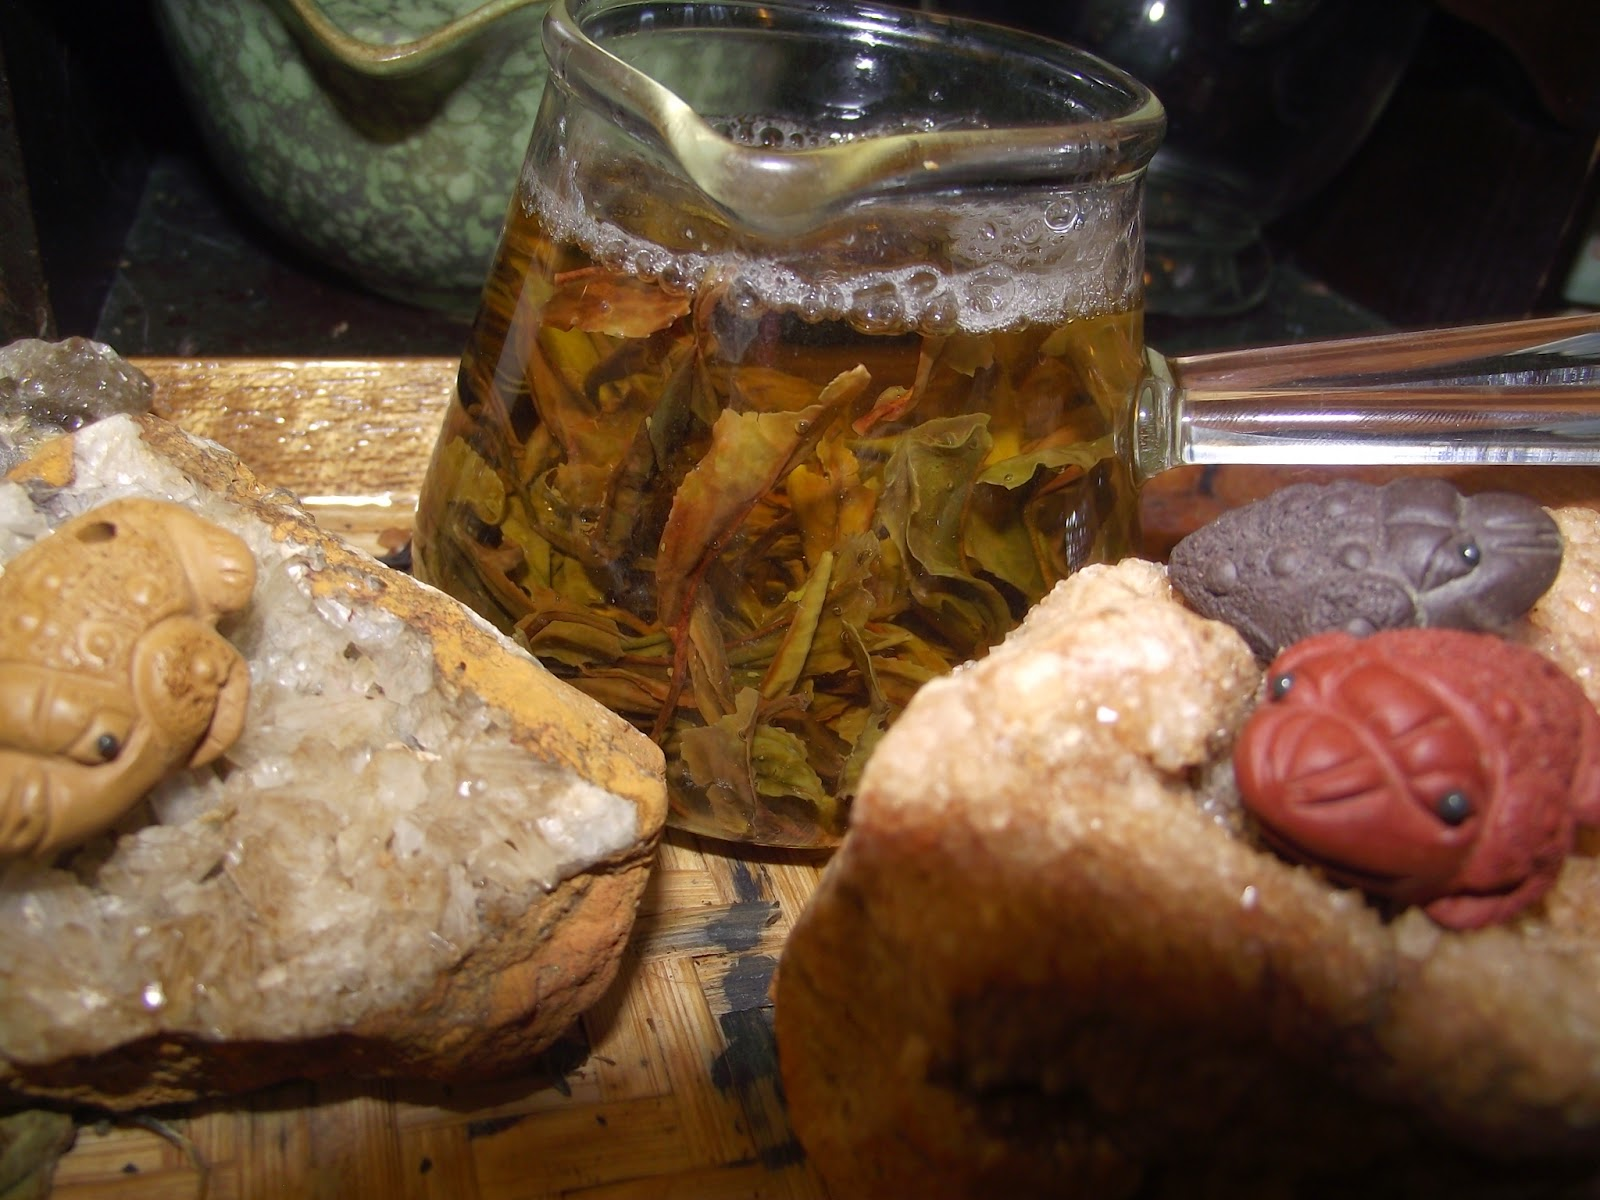 glendale nilgiri black tea, theteashelf